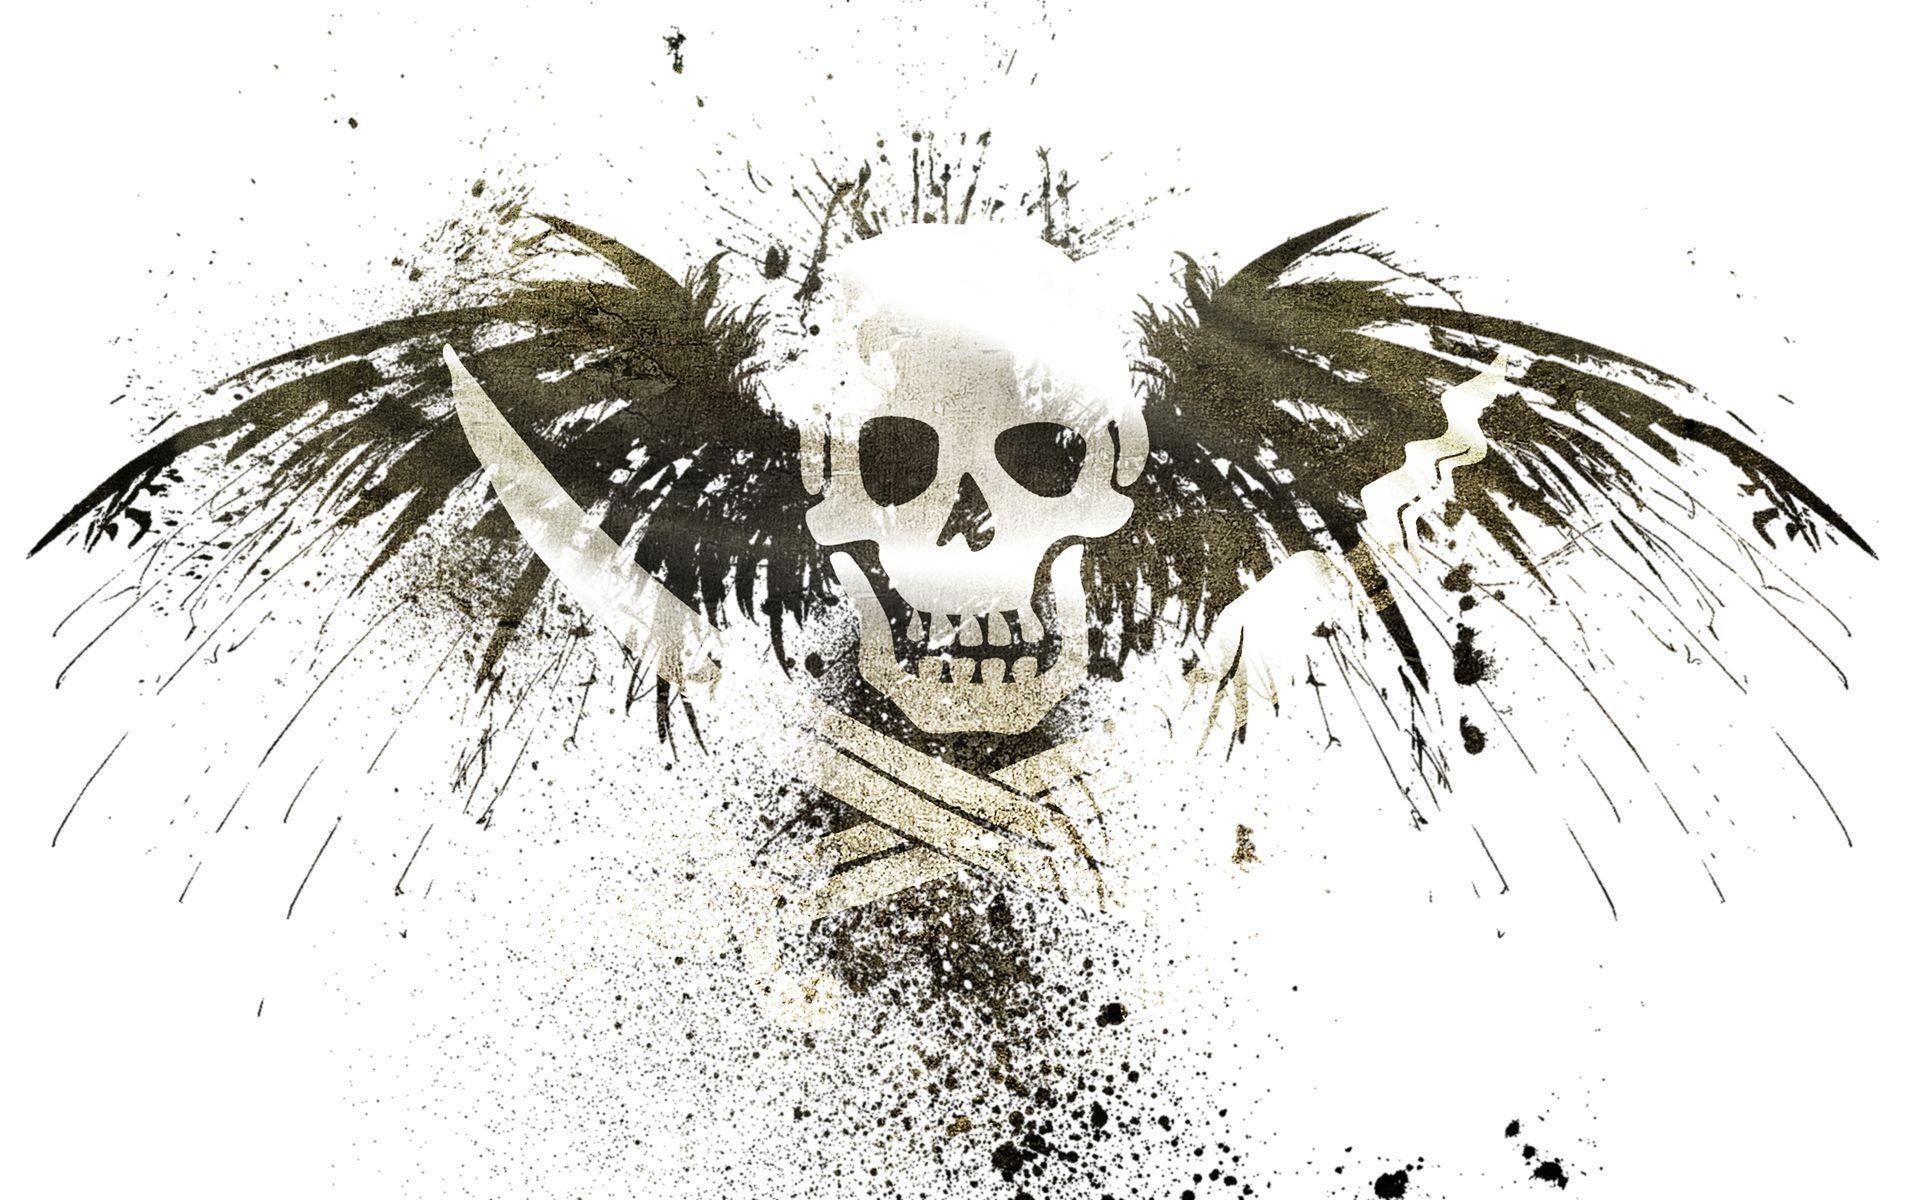 skulls, pirates, eagles, flags, skull and crossbones :: Wallpapers